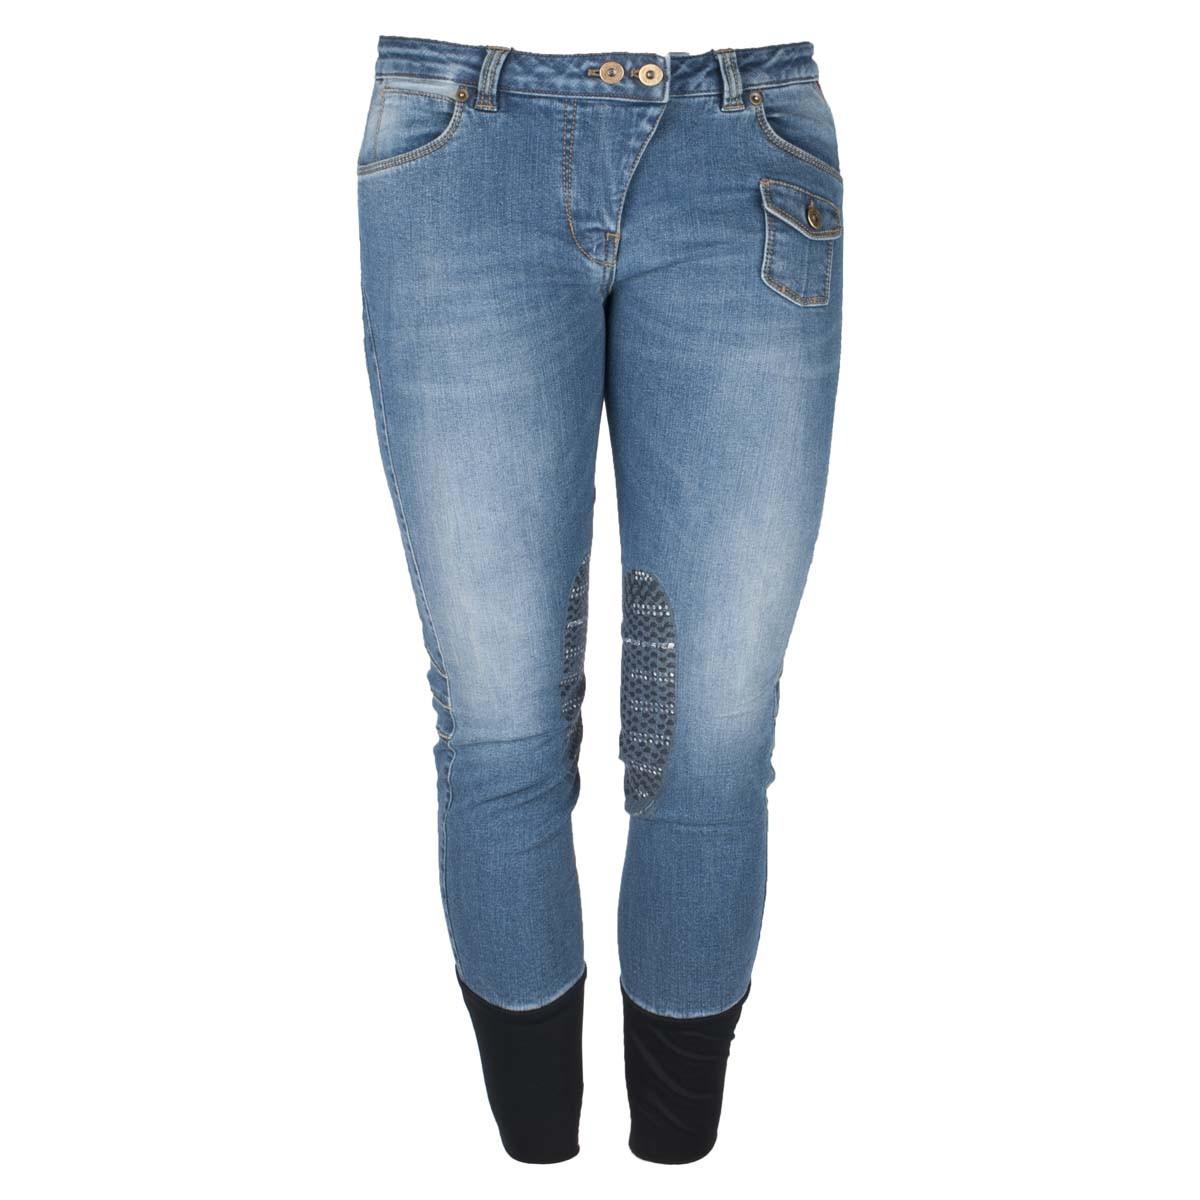 Animo Nuoto Rijbroek jeans maat:40